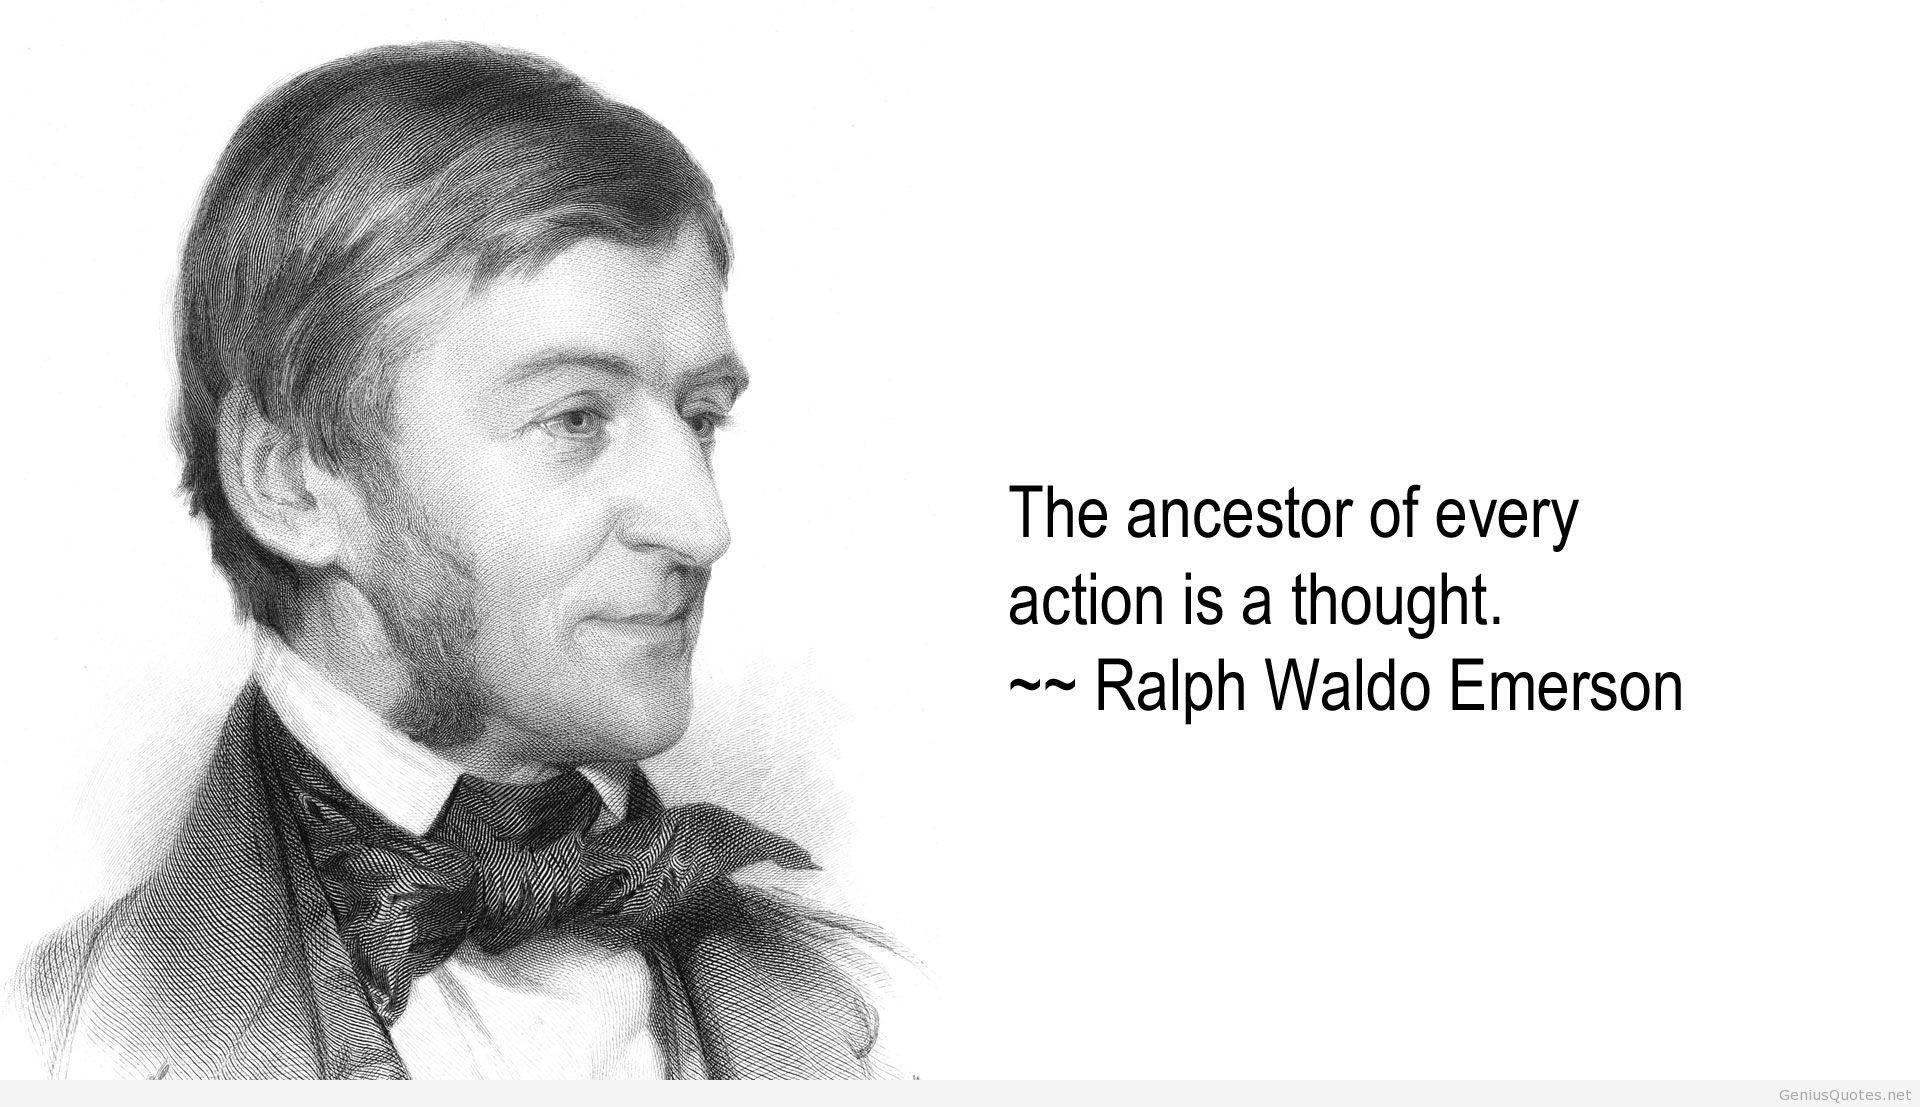 Ralph Waldo Emerson Writing Styles in Self-Reliance